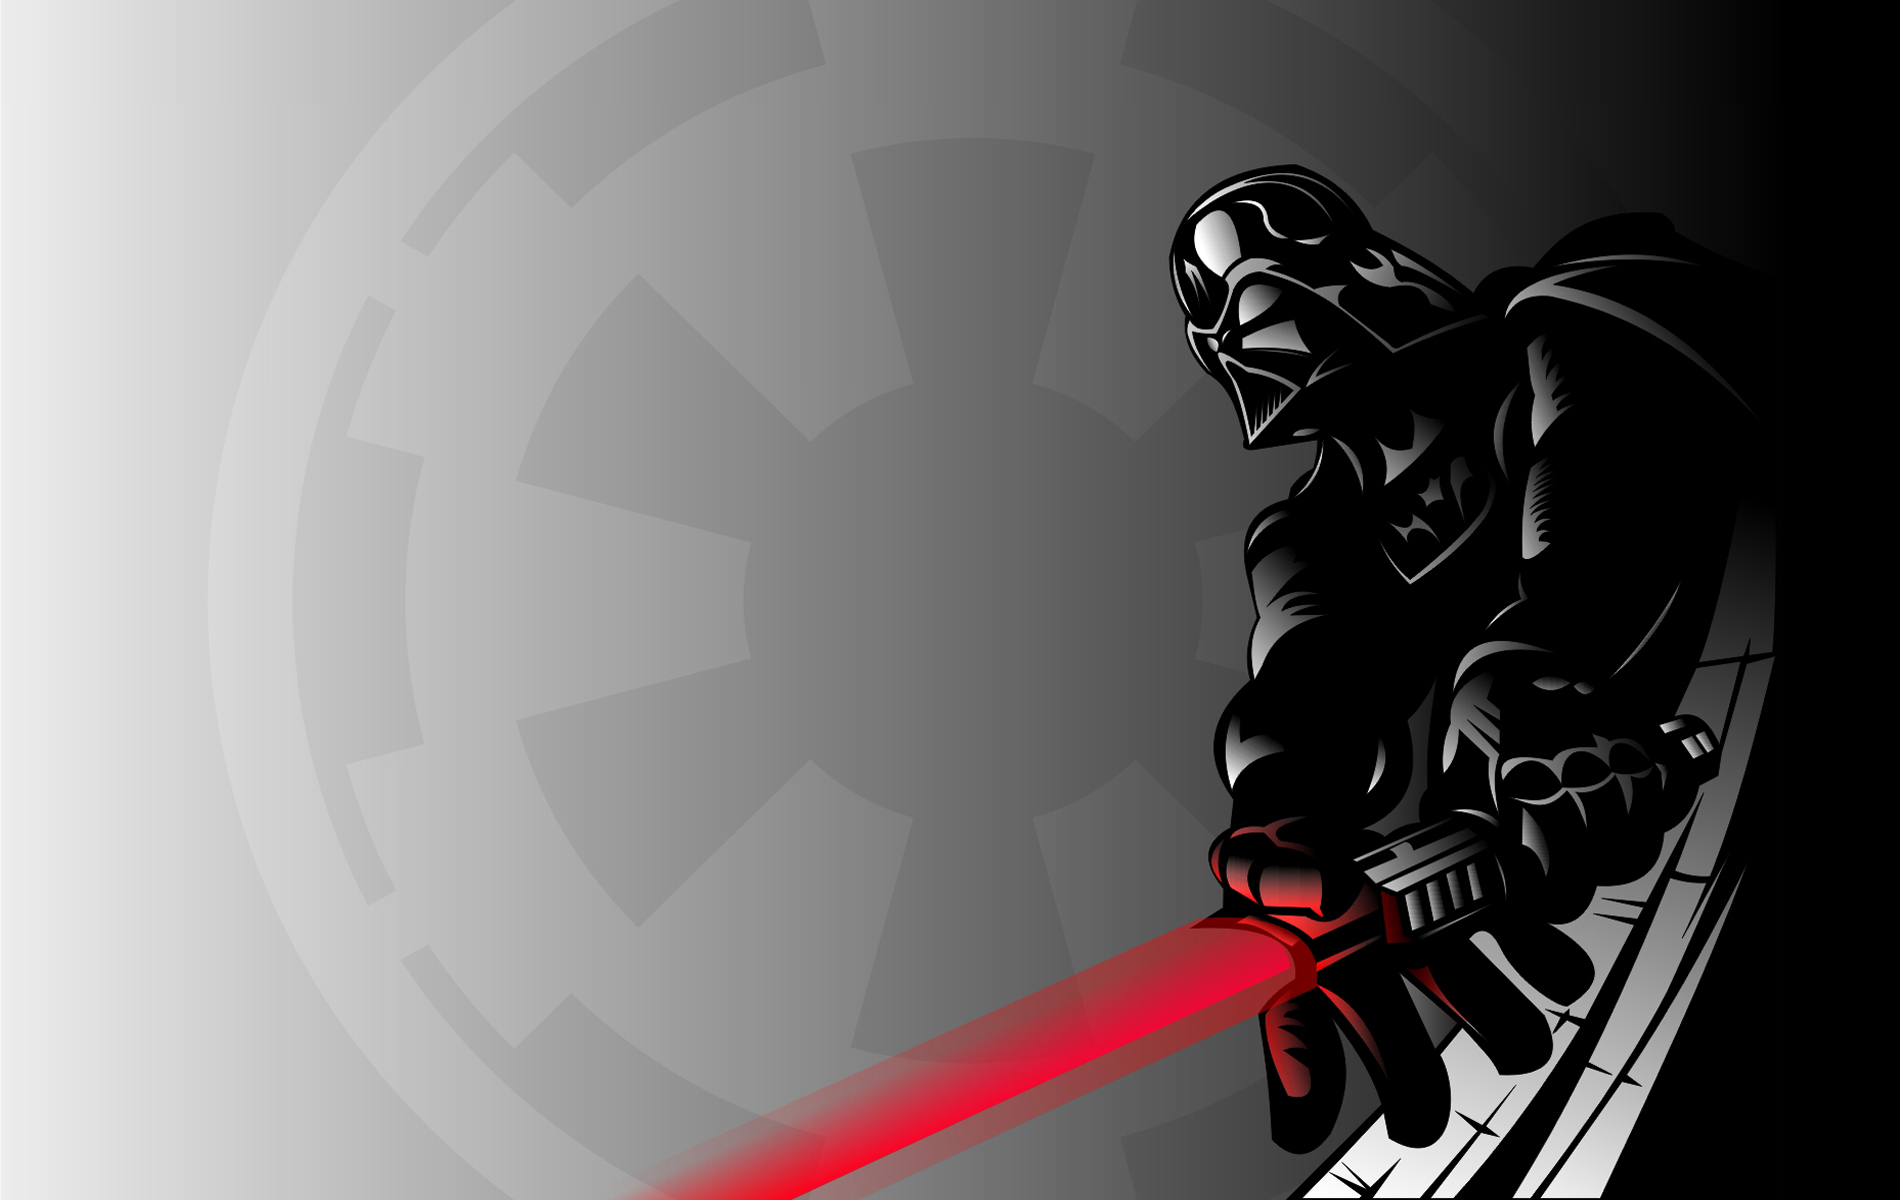 Star Wars Desktop Wallpapers FREE on Latorocom 1900x1200